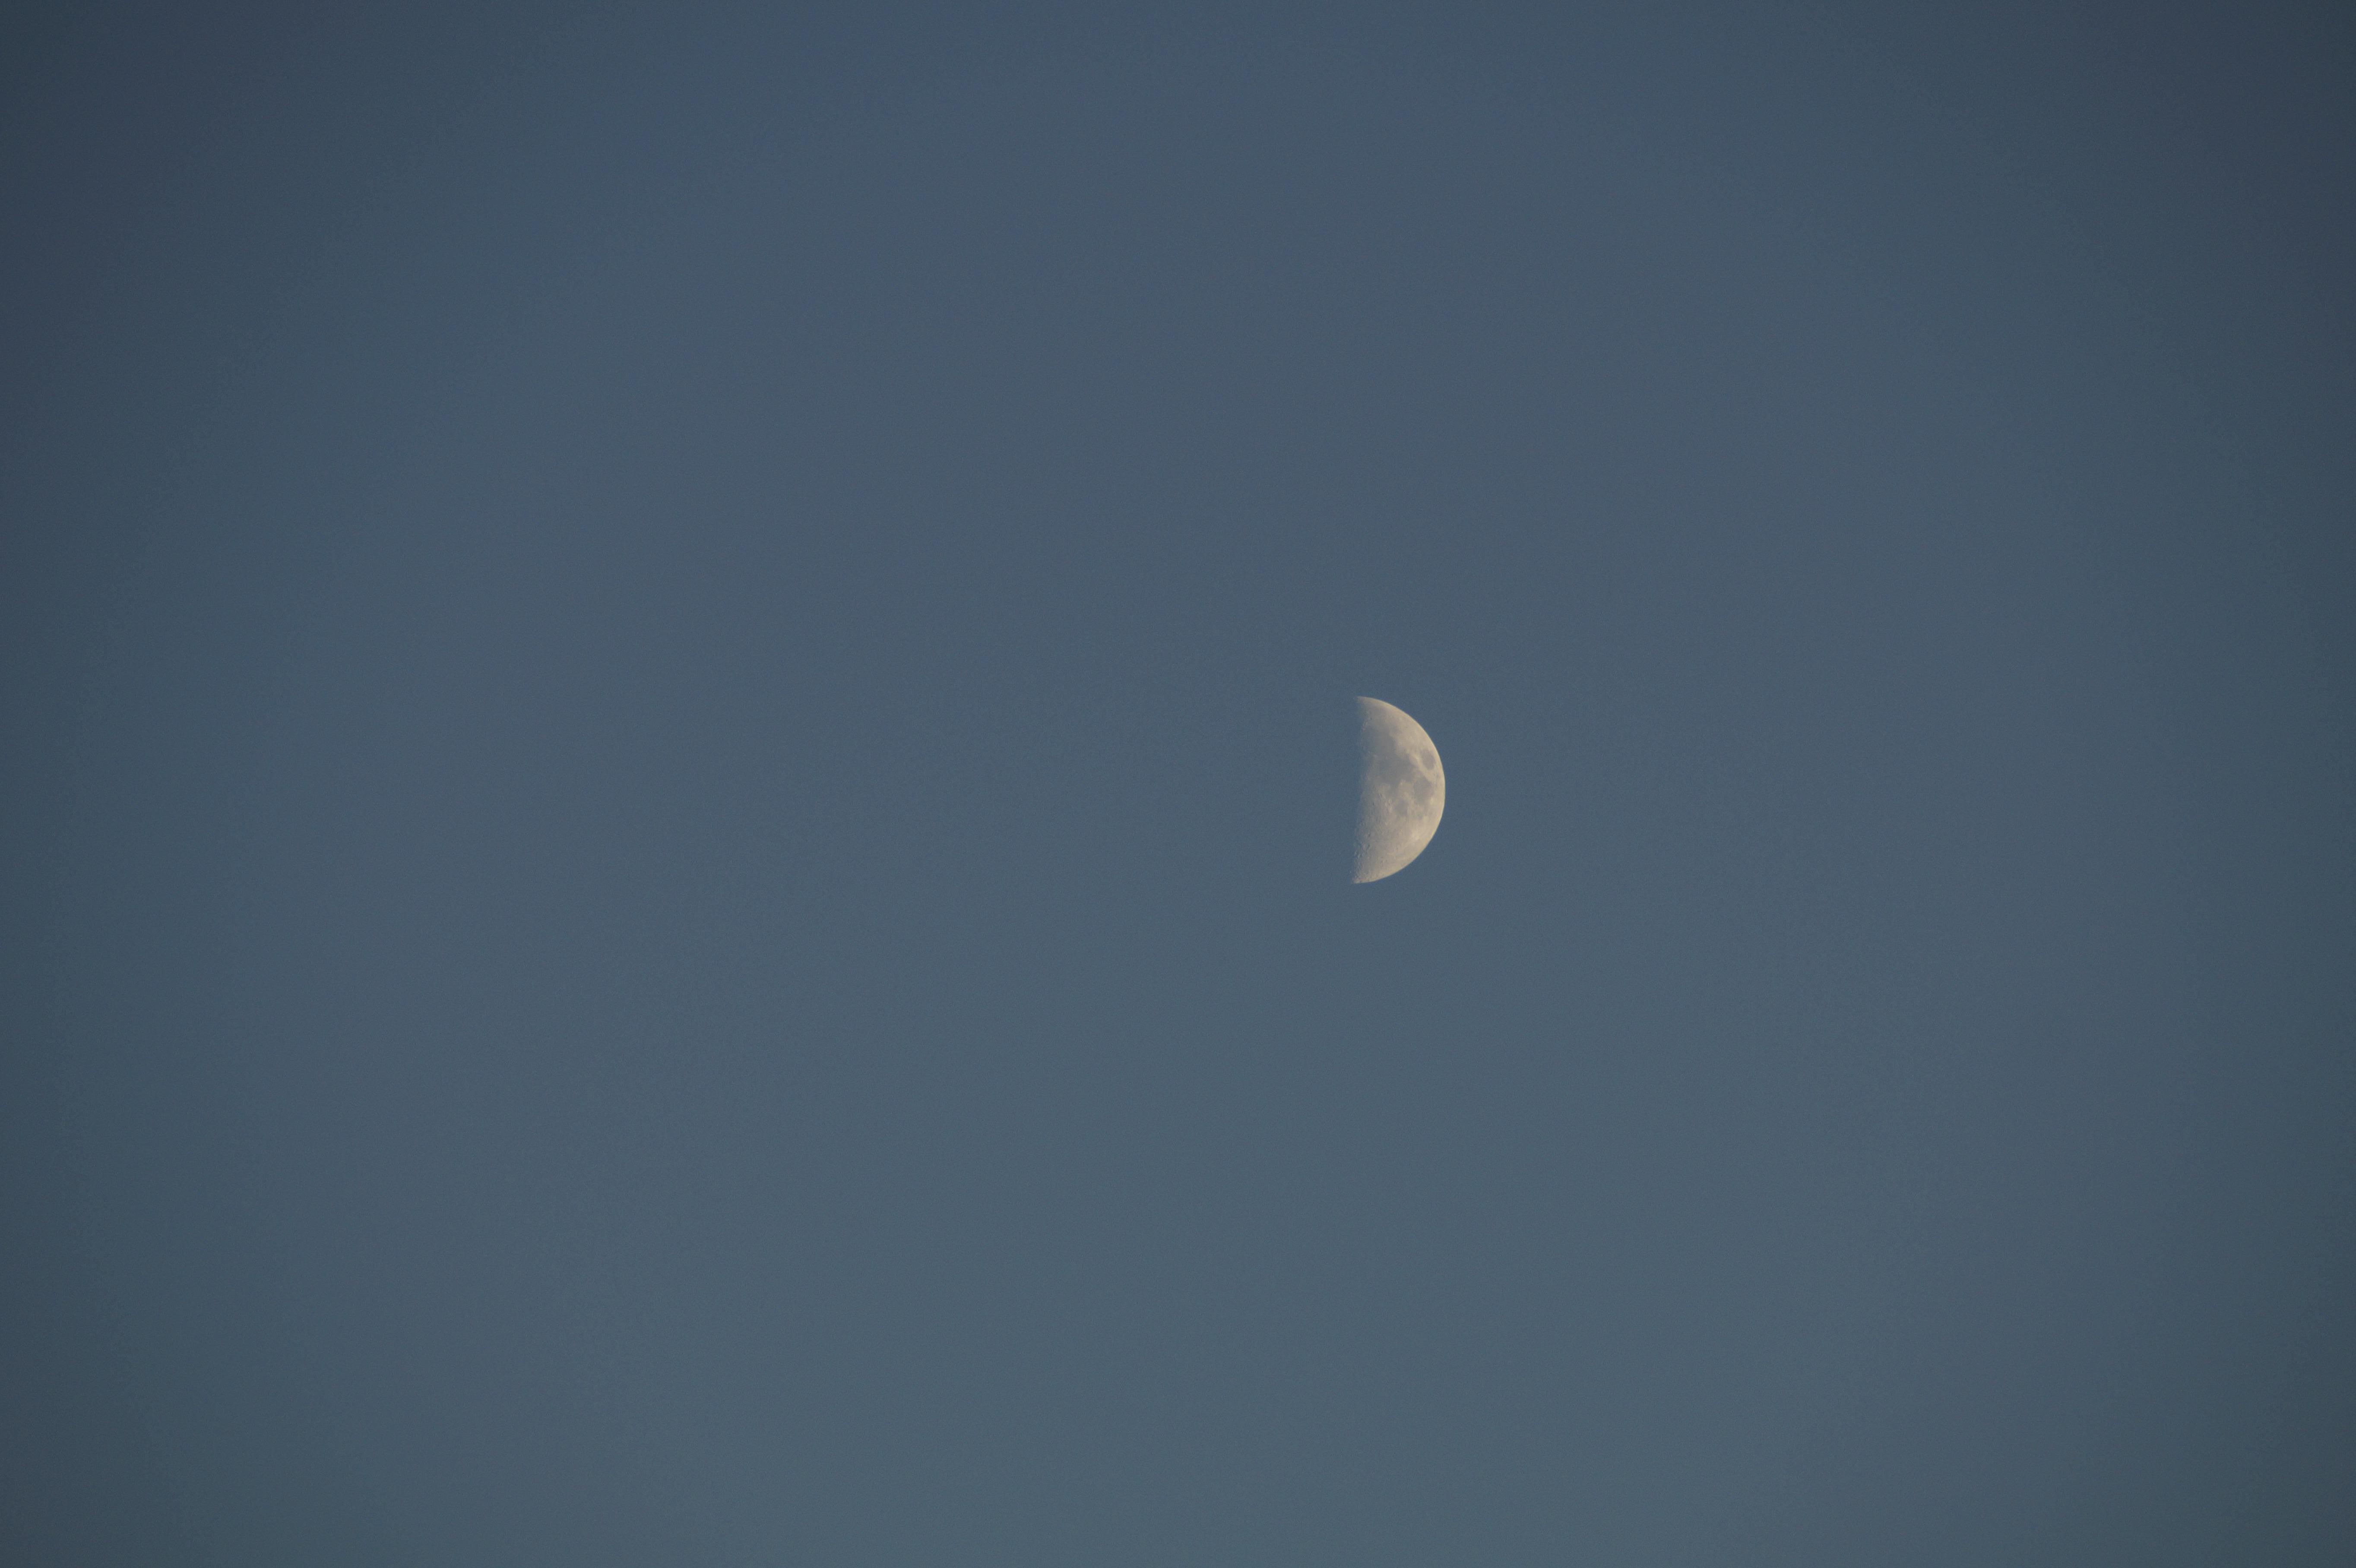 Gambar Suasana Siang Hari Langit Malam Fenomena Bulan Sabit